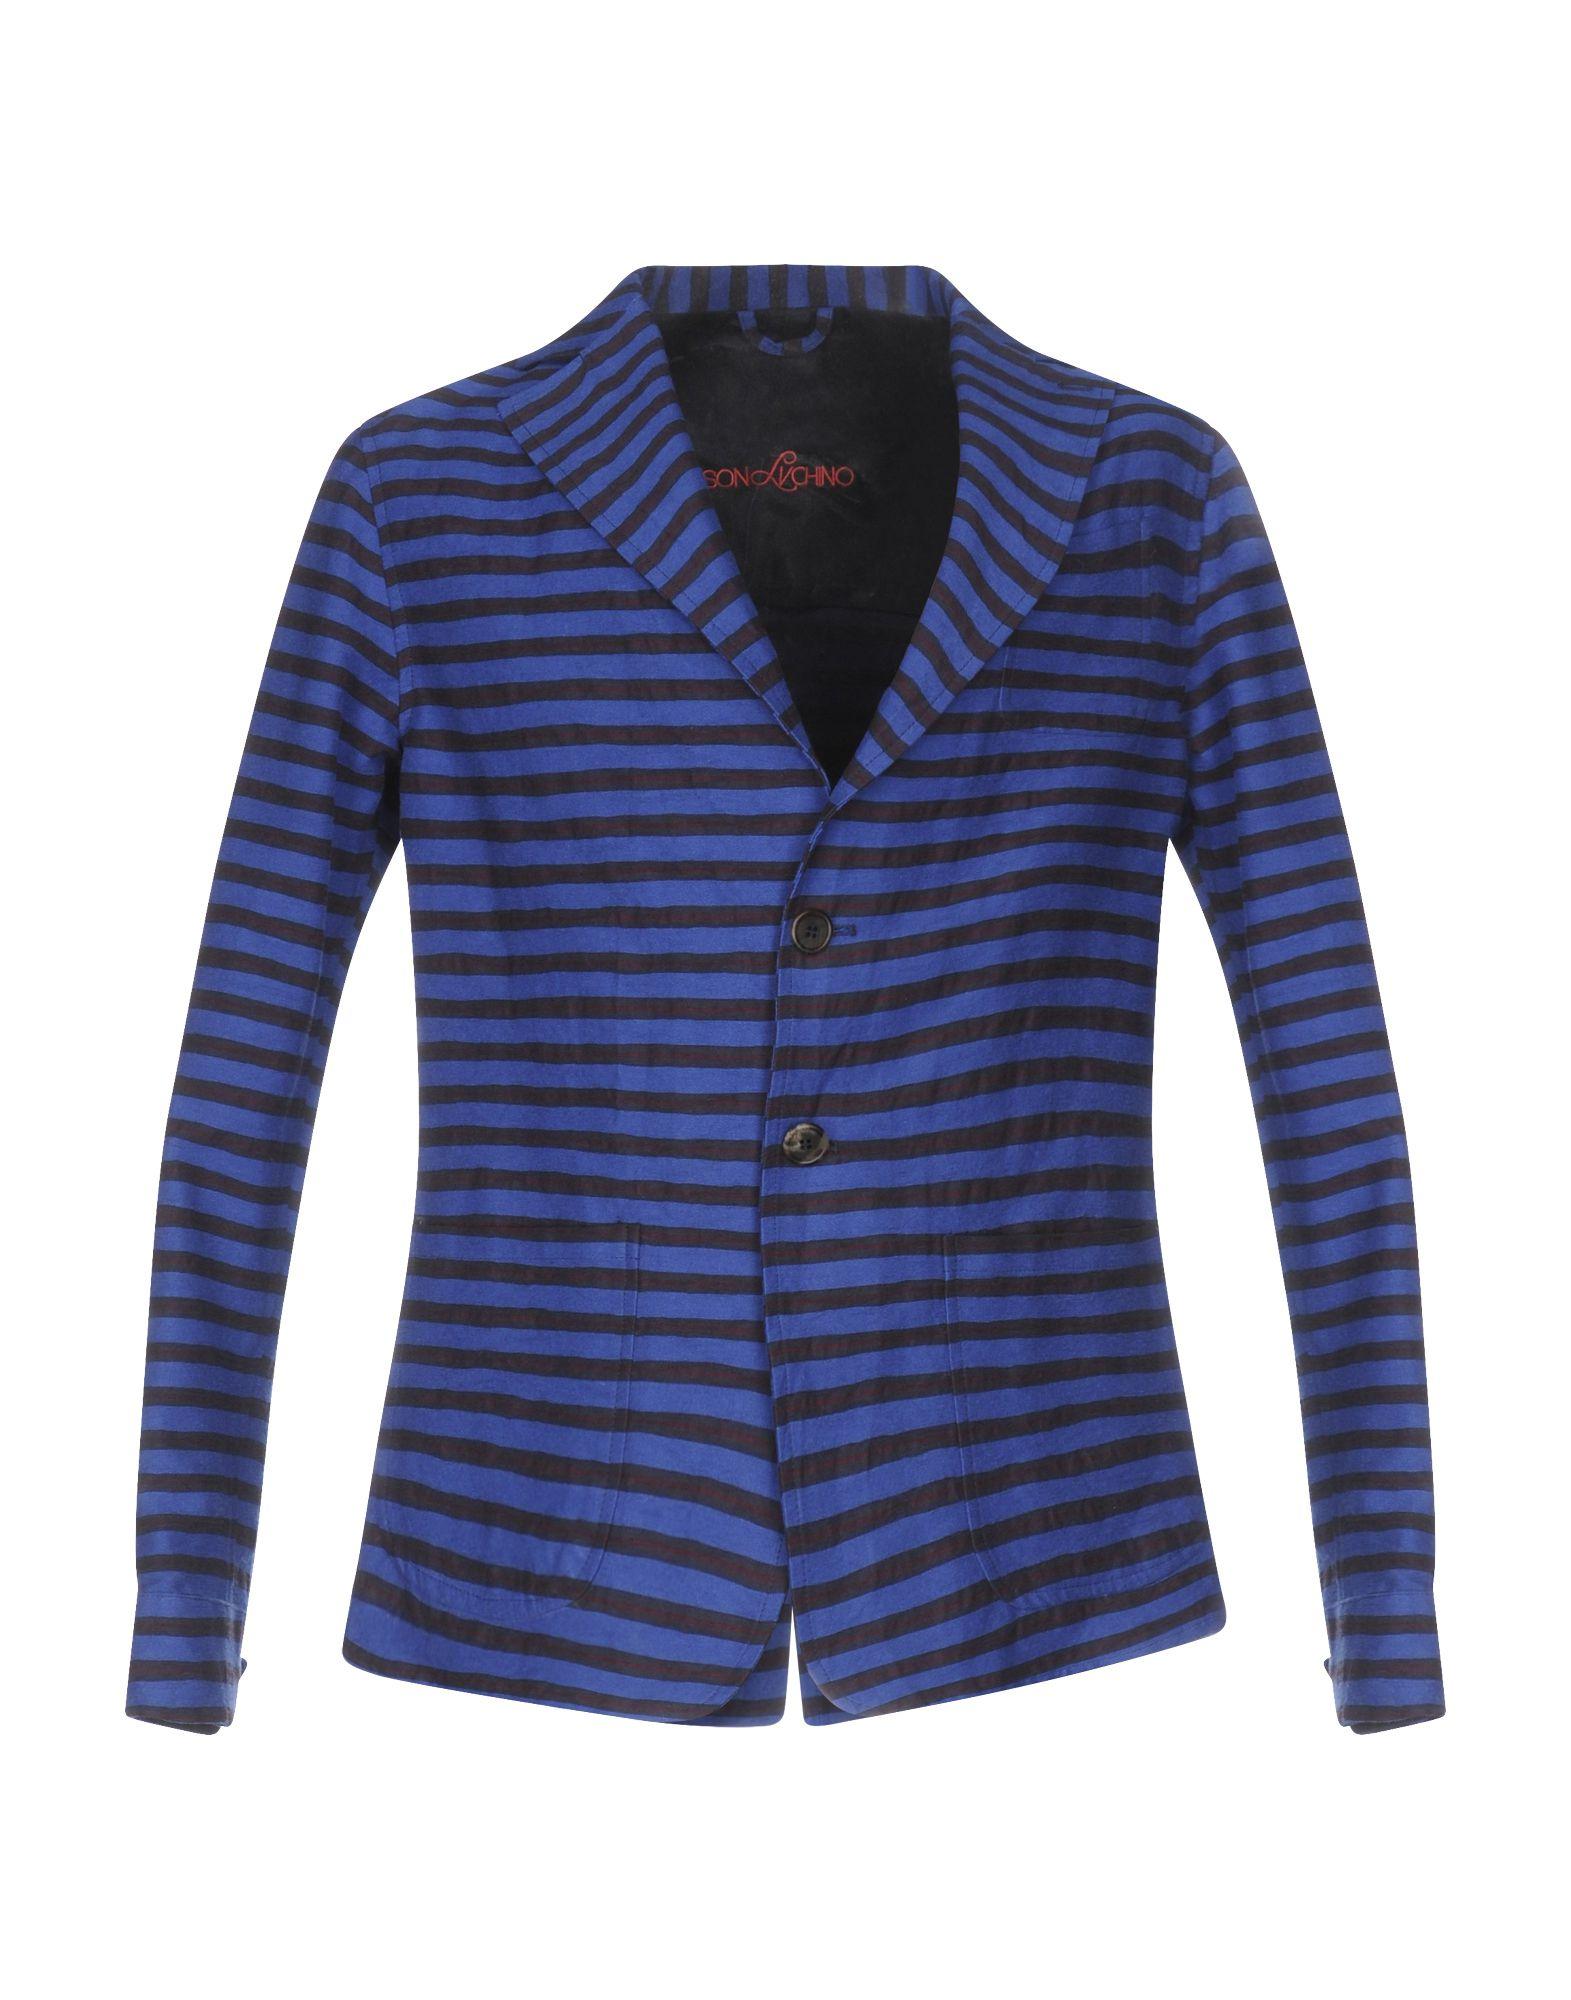 MAISON LVCHINO Blazer in Blue